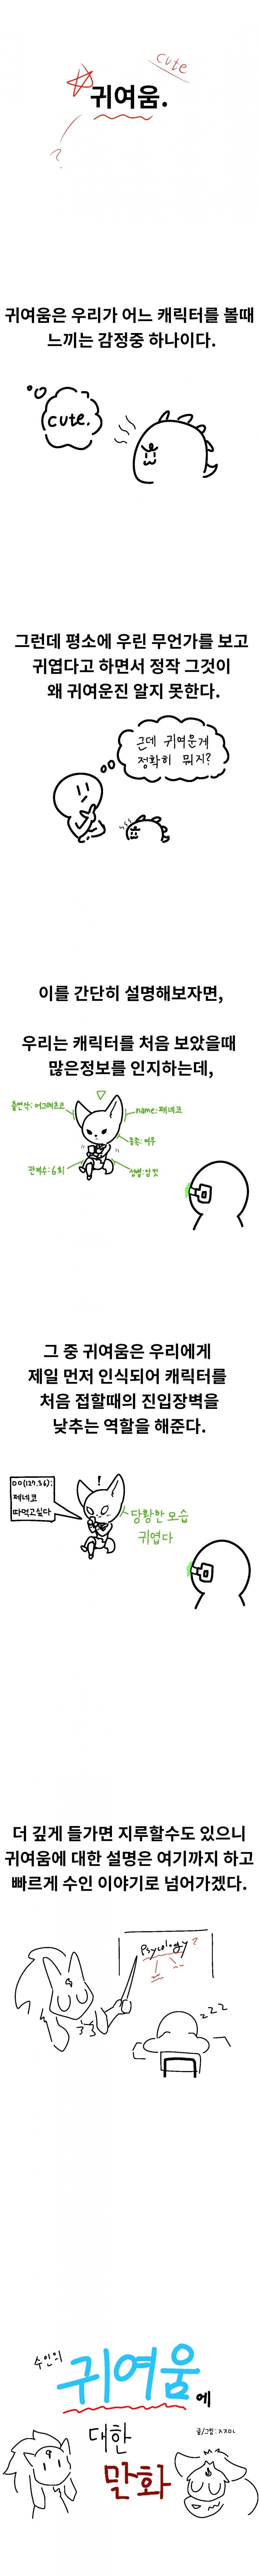 viewimage.php?id=2ba8c234fc&no=24b0d769e1d32ca73cec83fa11d0283146e1de228a7923f189a7bc55982b7e6958ff11bbcb8295d2d7a4c78b872f4fc2f76f0780660be2c8498a642503a08ae98b396b6d1c4e34a8ea685e6e4e61c10fb791